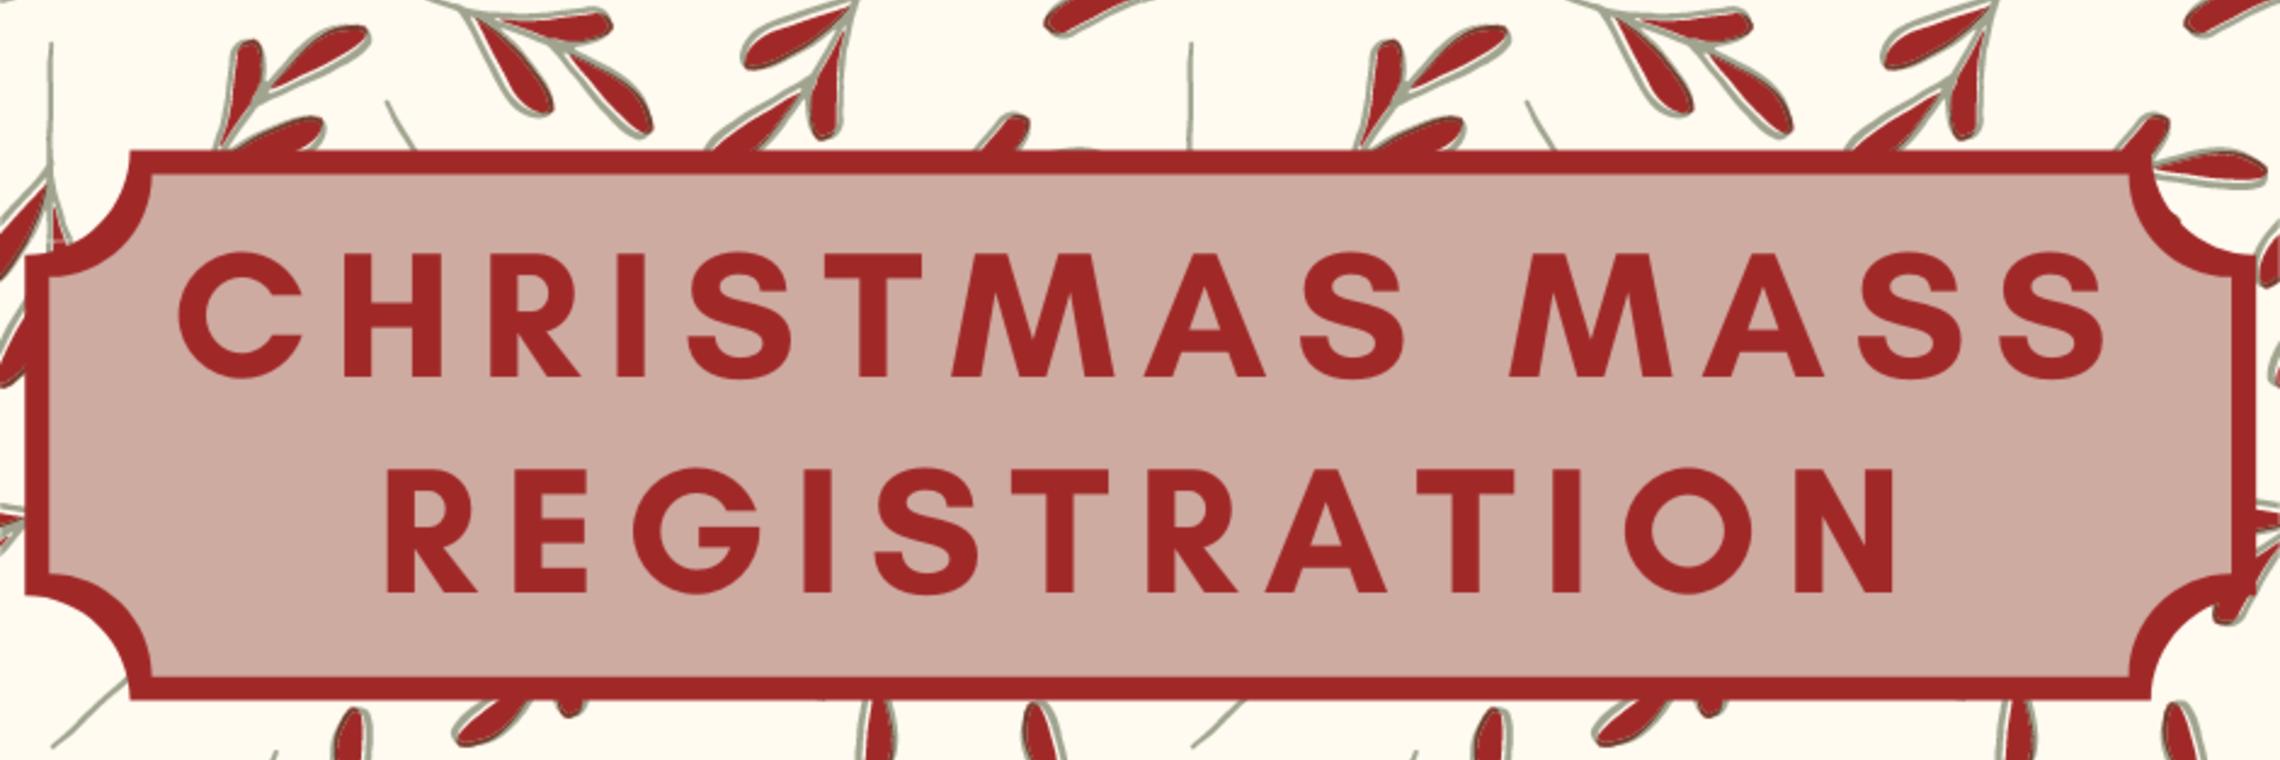 Christmas Mass Registration Banner